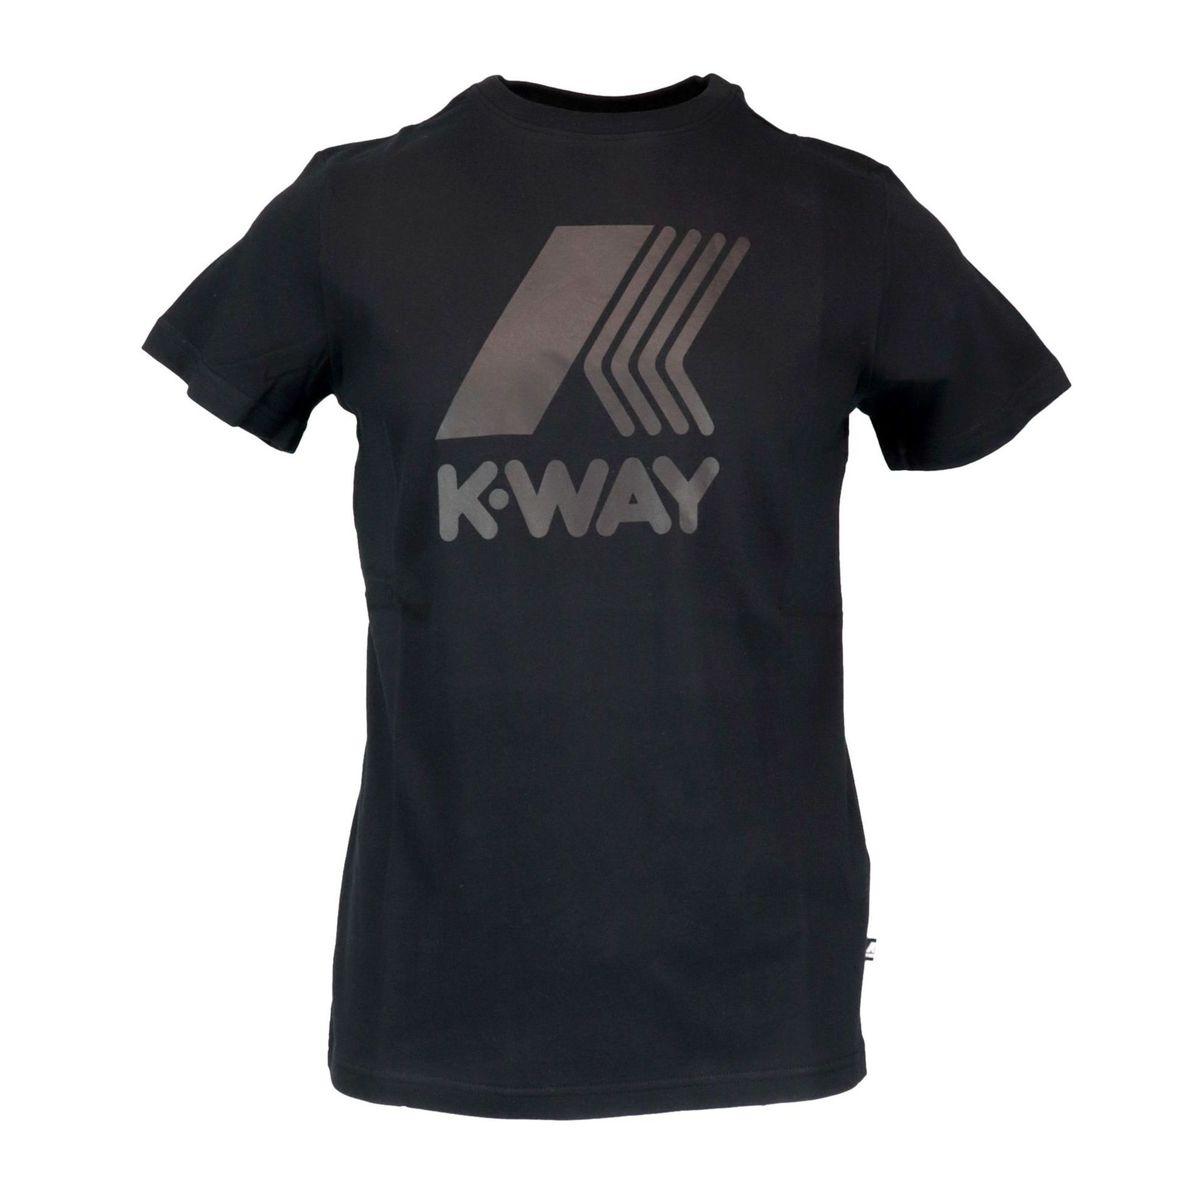 Elliot cotton T-shirt with large logo print Black K-Way